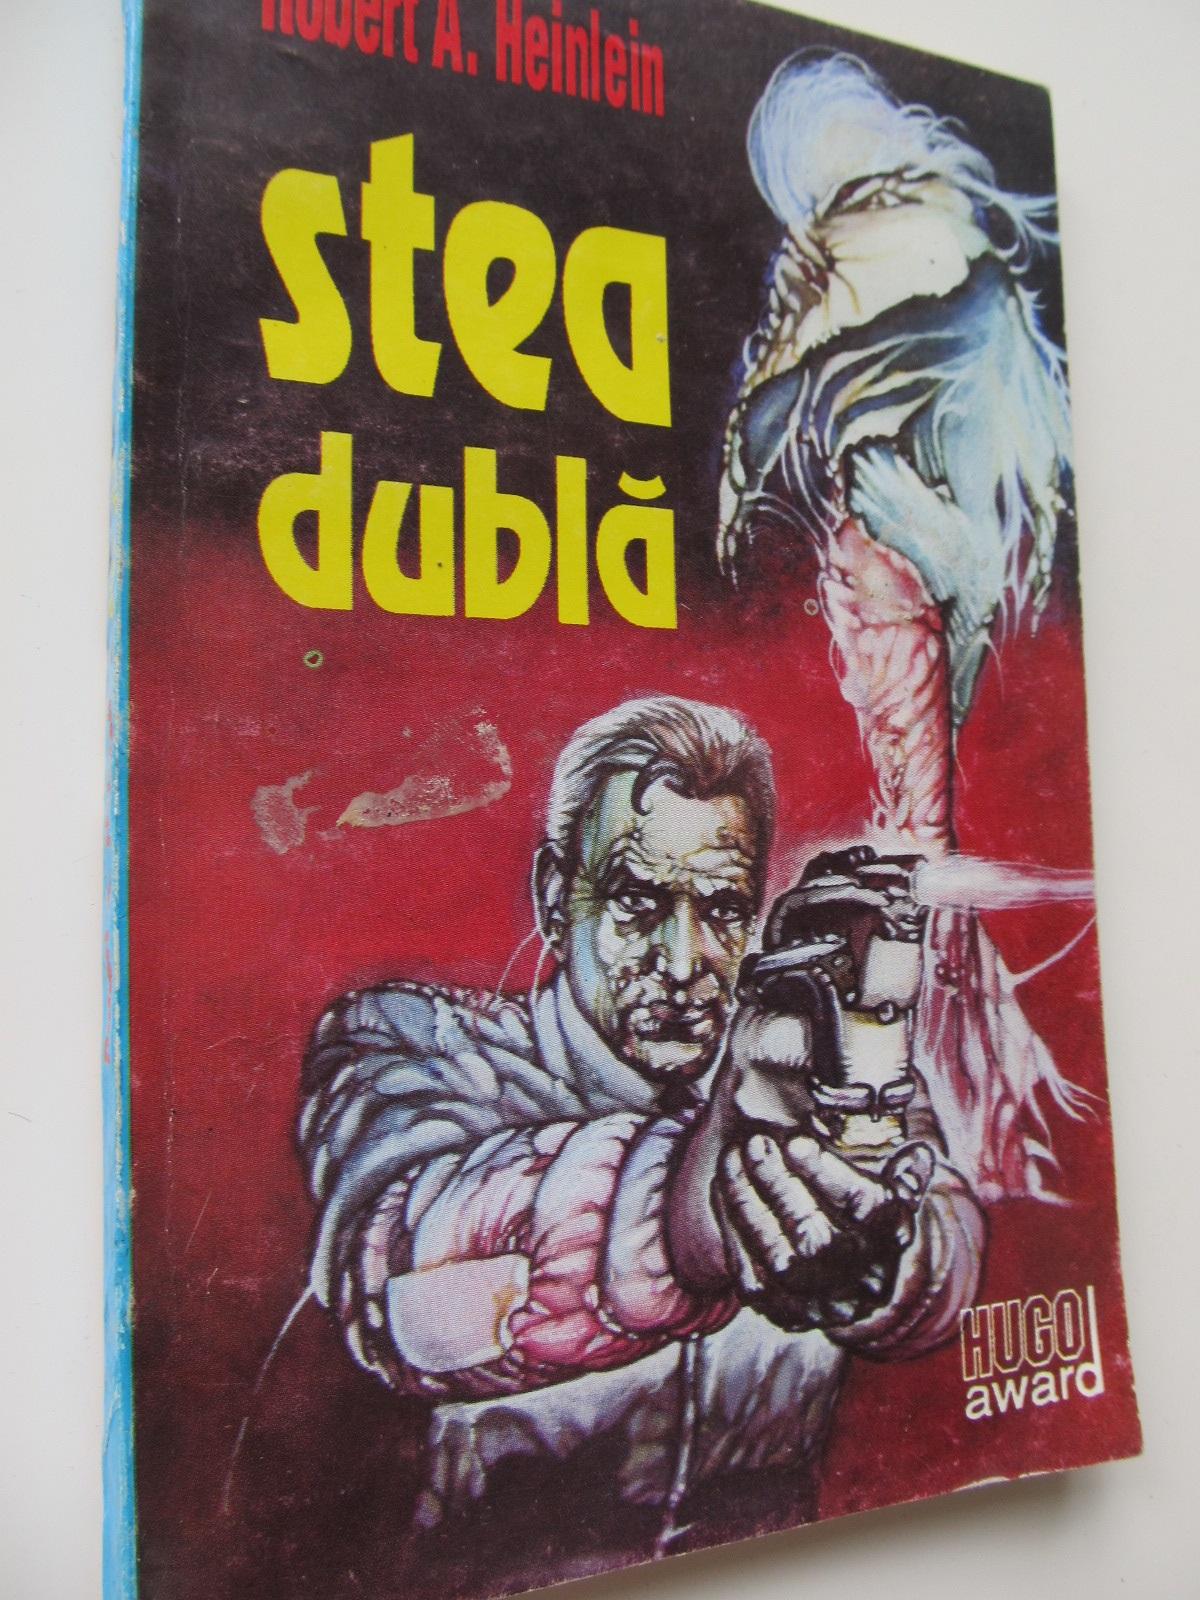 Stea dubla - Robert A. Heinlein | Detalii carte